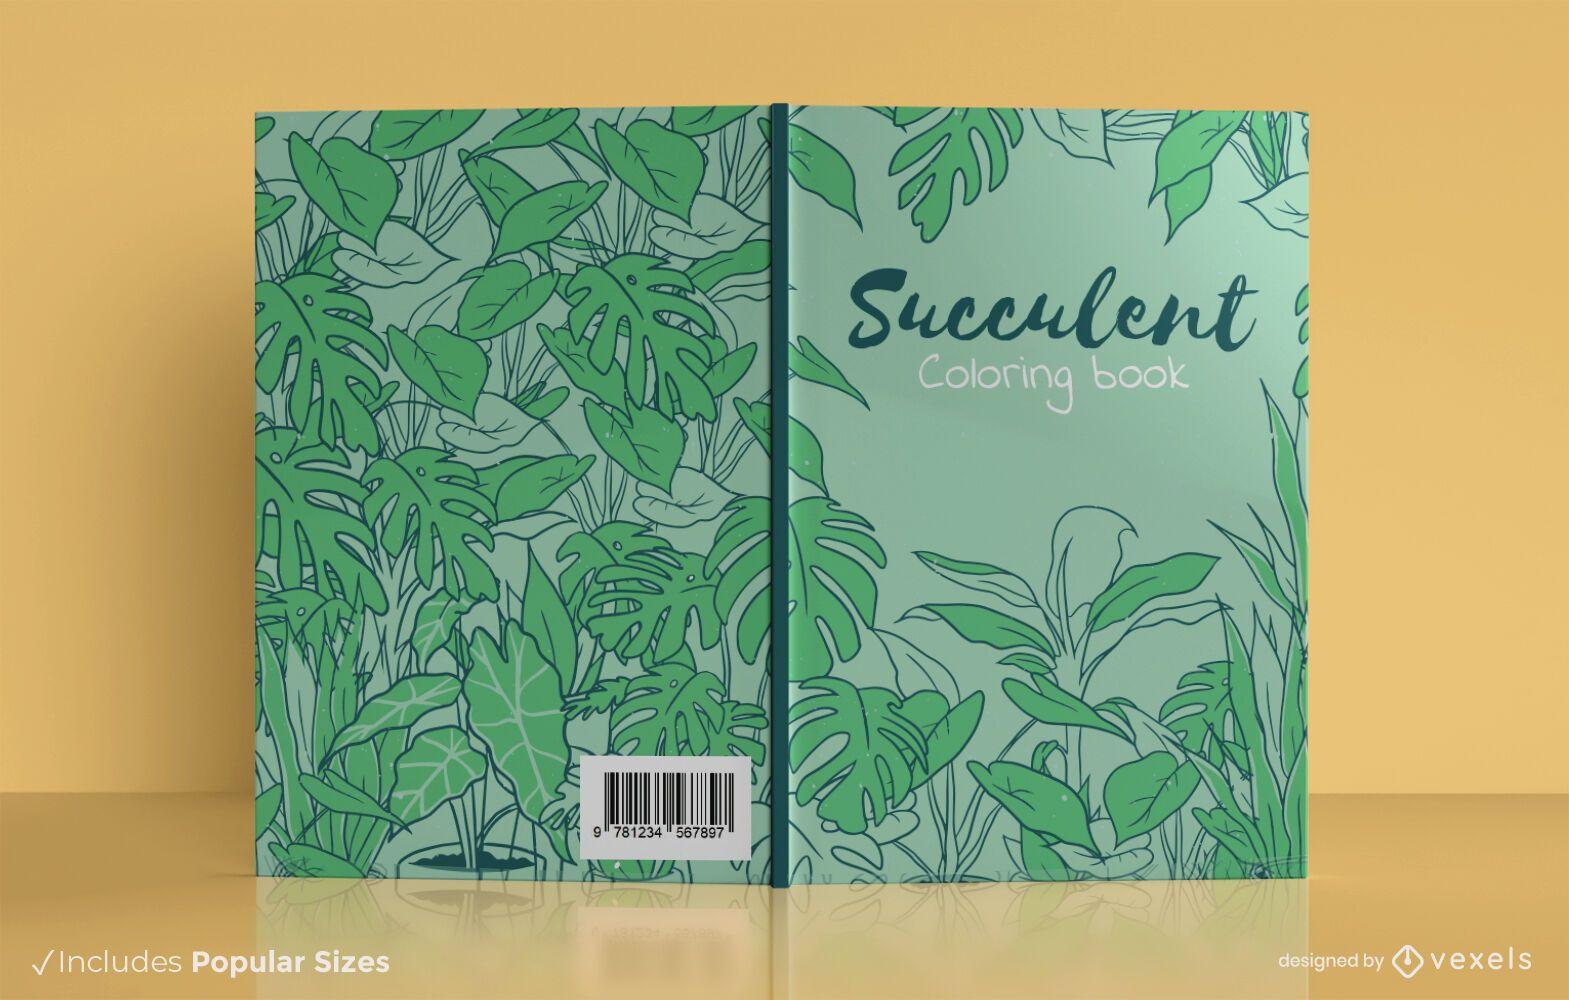 Design de capa de livro para colorir suculento